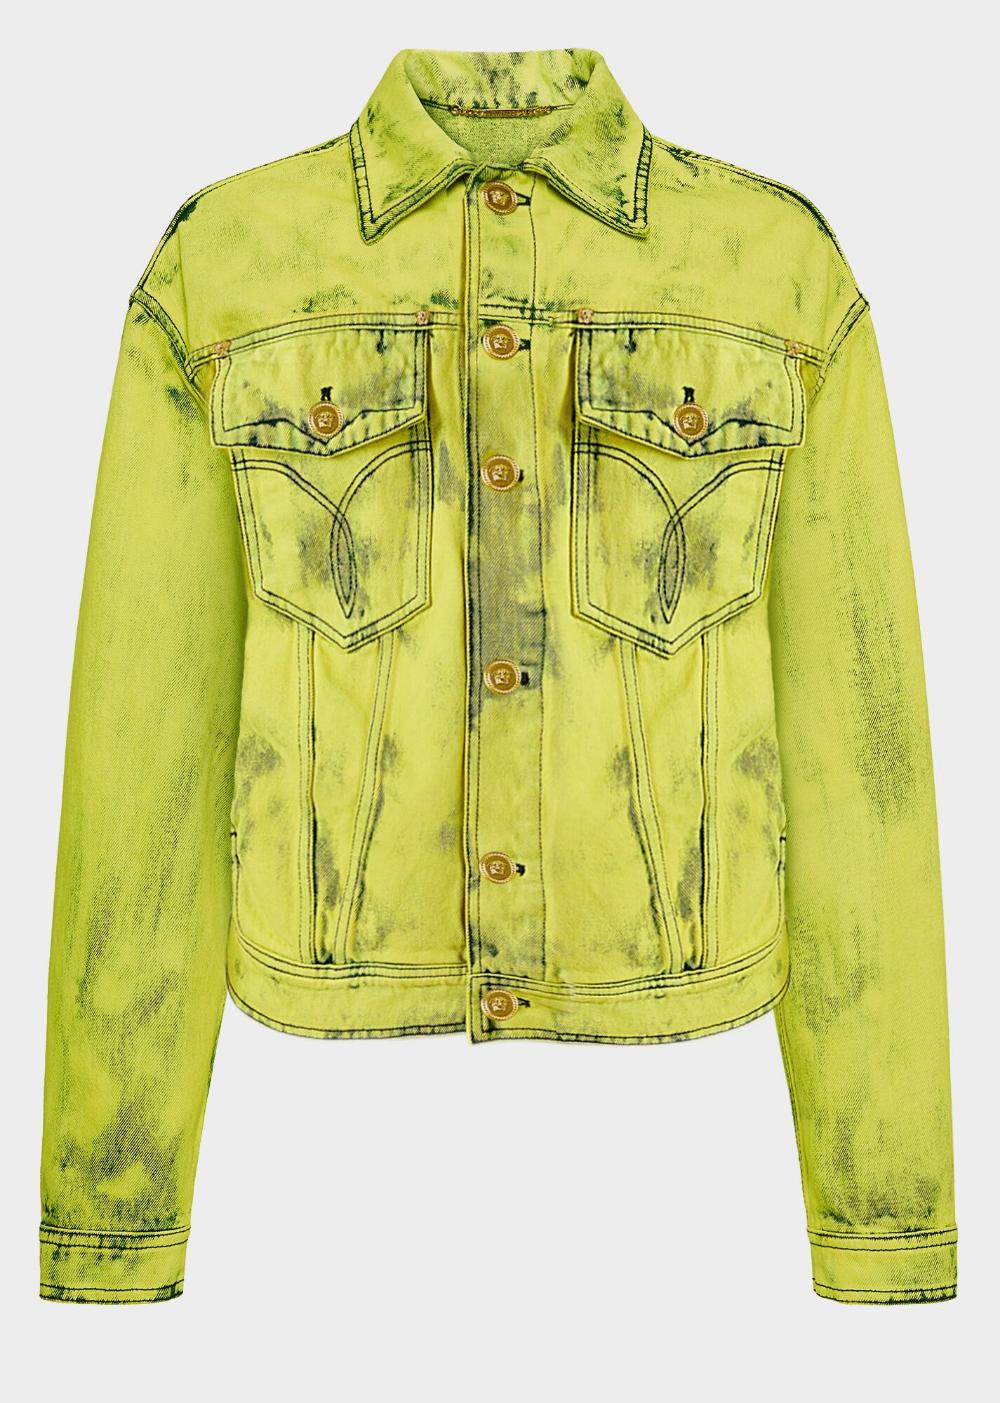 Versace Fluo Denim Jacket For Men 1495 Eur Button Up Collared Long Sleeve Denim Jacket In A Fluoresce Denim Jacket Men Denim Jacket Long Sleeve Denim Jacket [ 1403 x 1000 Pixel ]